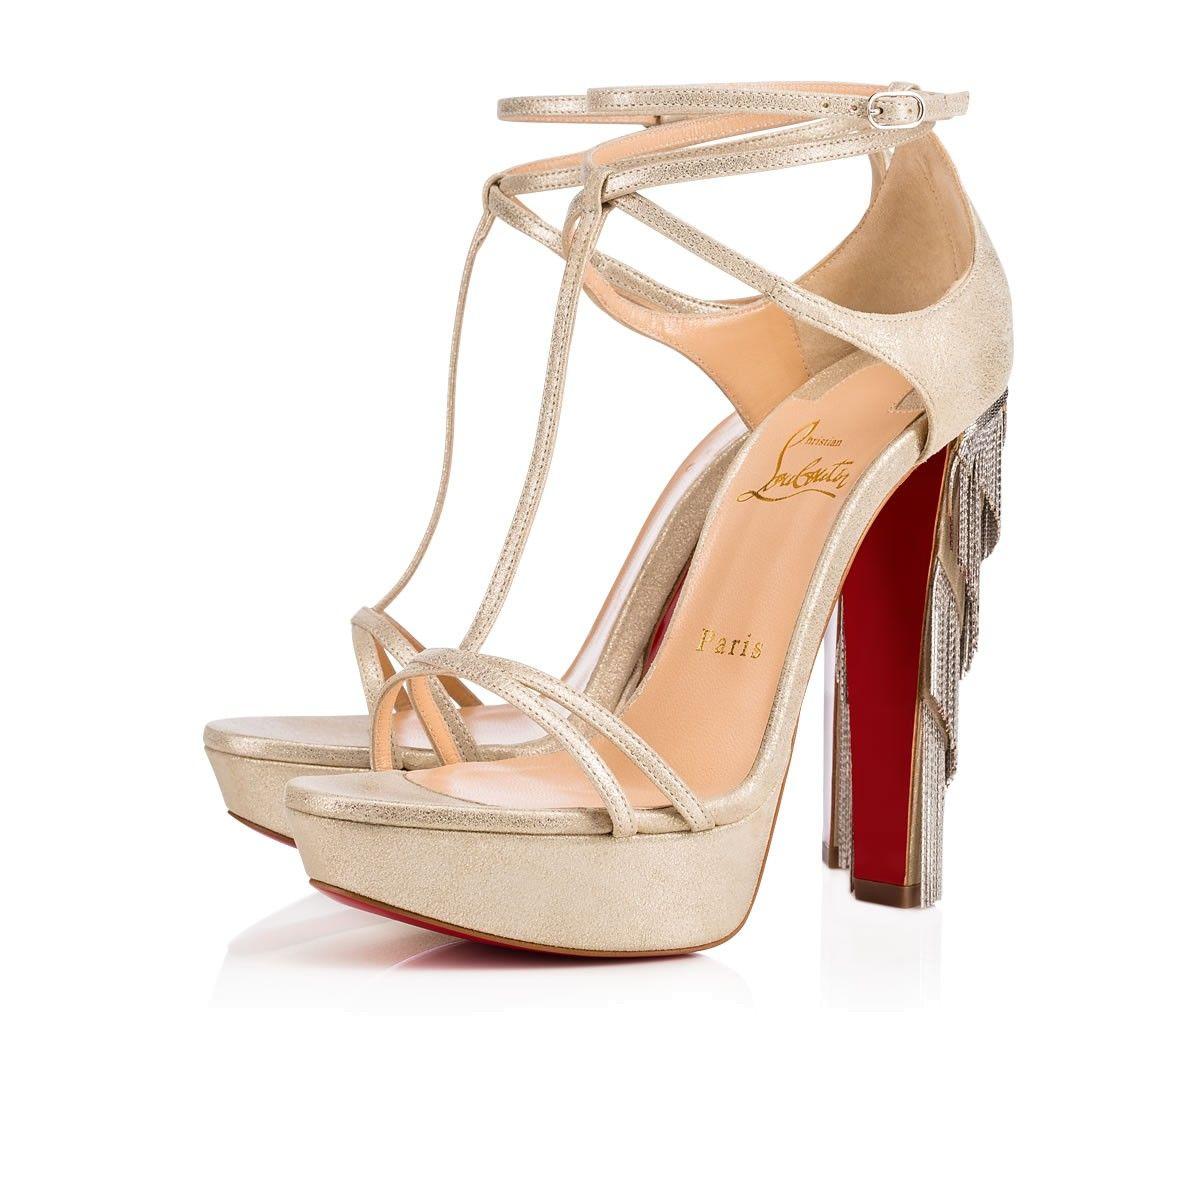 d175b7ea122d CHRISTIAN LOUBOUTIN Golden Blake 140 Platine Suede - Women Shoes - Christian  Louboutin.  christianlouboutin  shoes